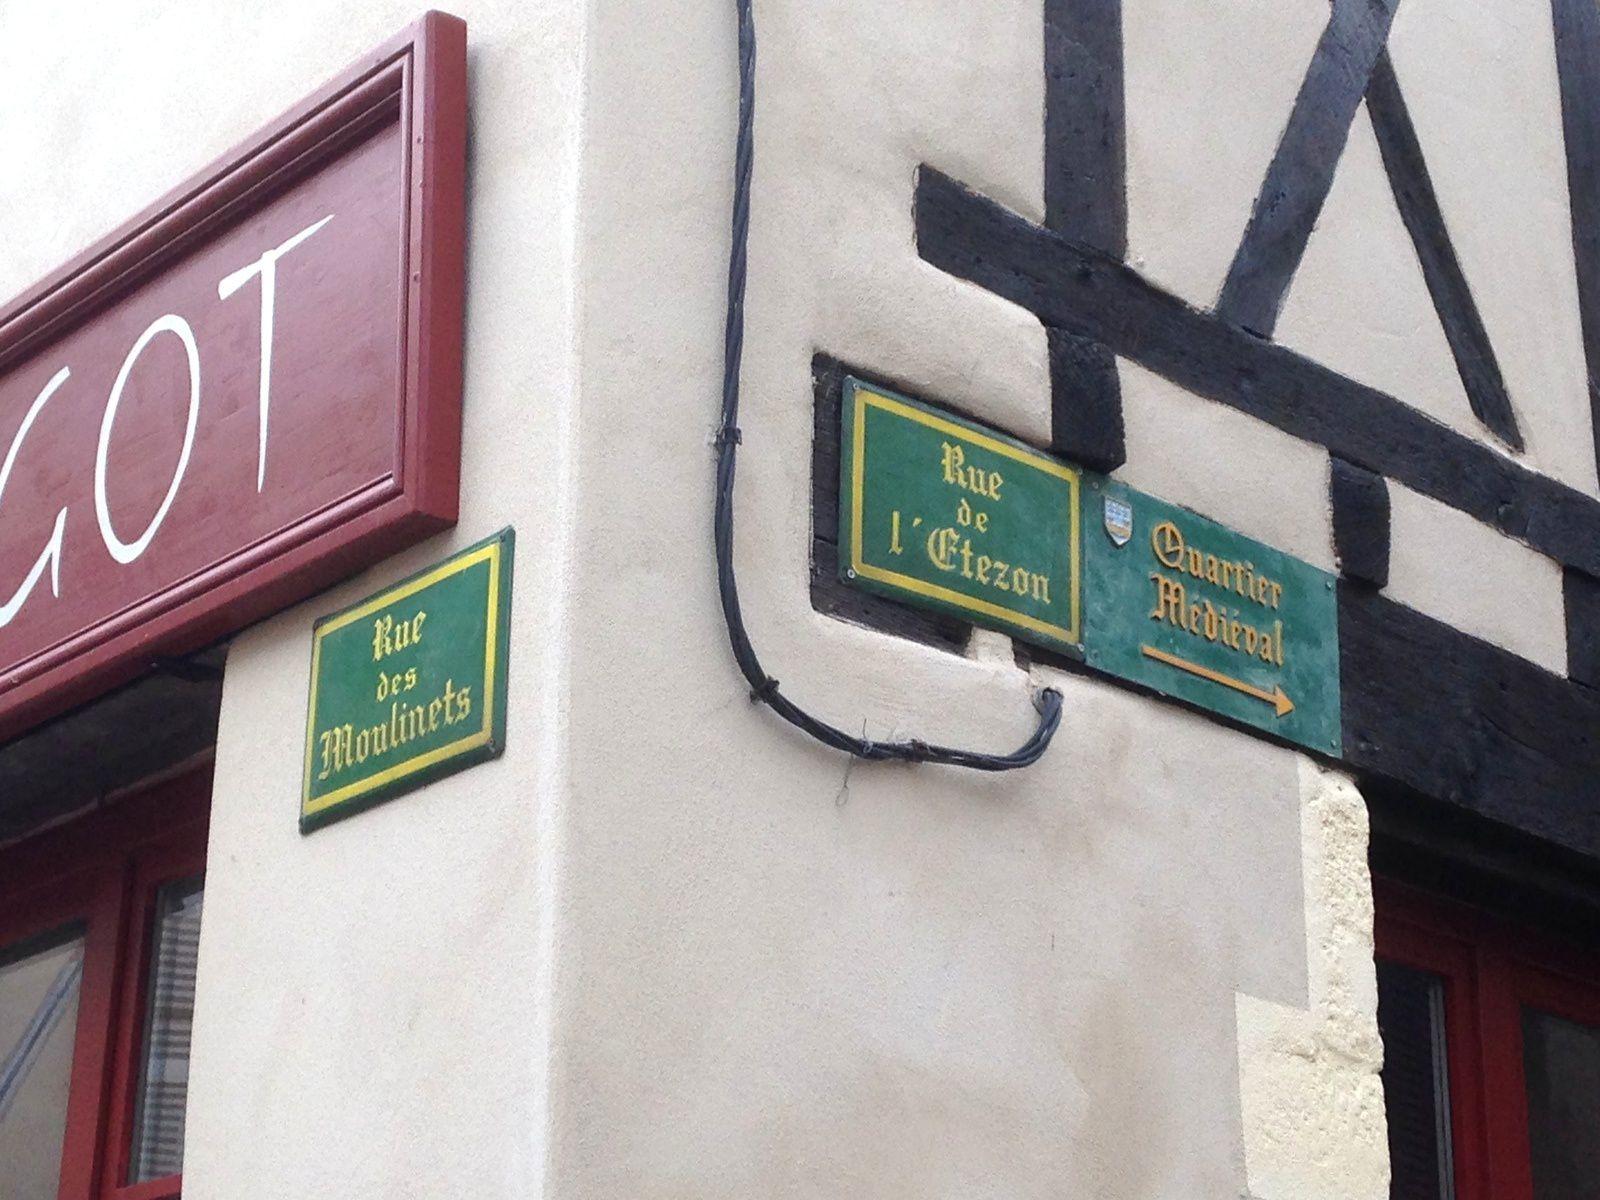 ecriture des villes #billom #auvergne #france #charlotteblabla